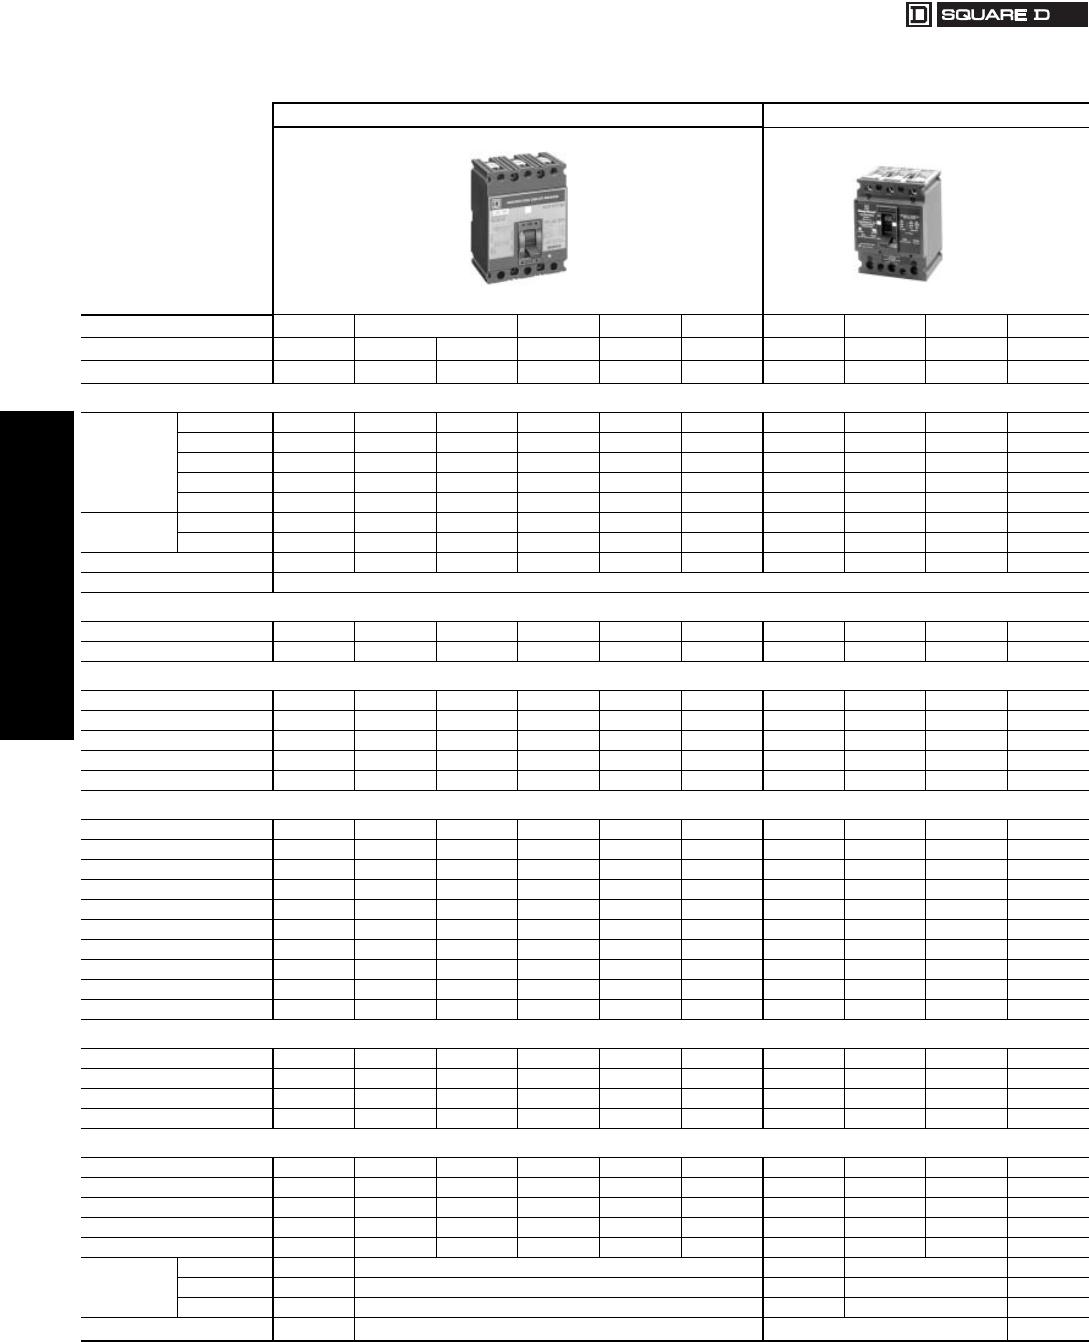 SQUARE D 15 AMP CIRCUIT BREAKER 600 VAC 2 POLE FHL26015